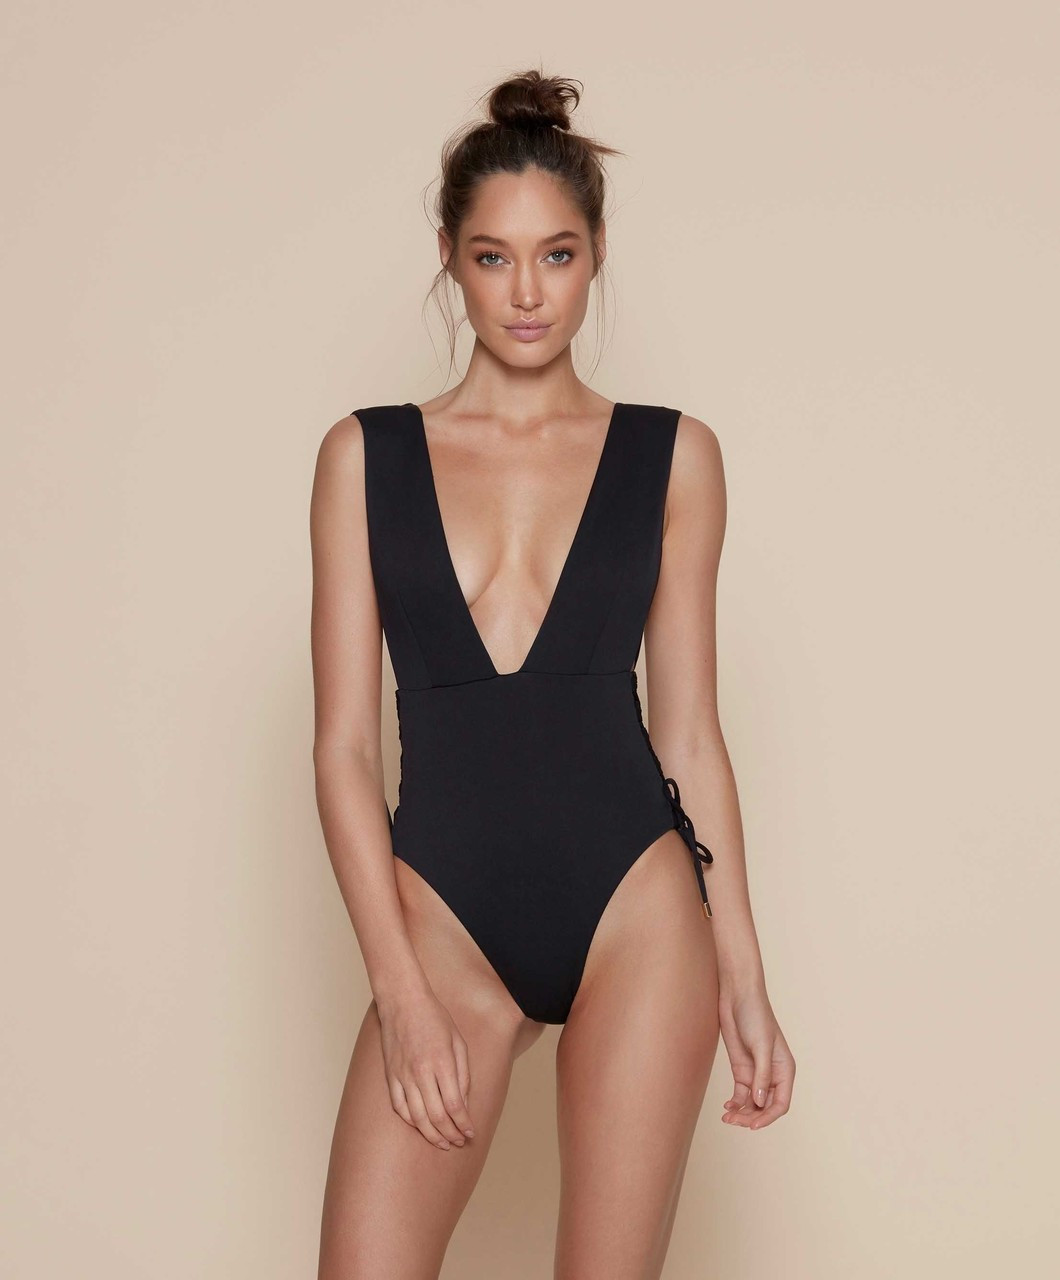 83270edc61 Kopper and Zink Swimwear Hudson One Piece Swimsuit   Shop Boutique Flirt